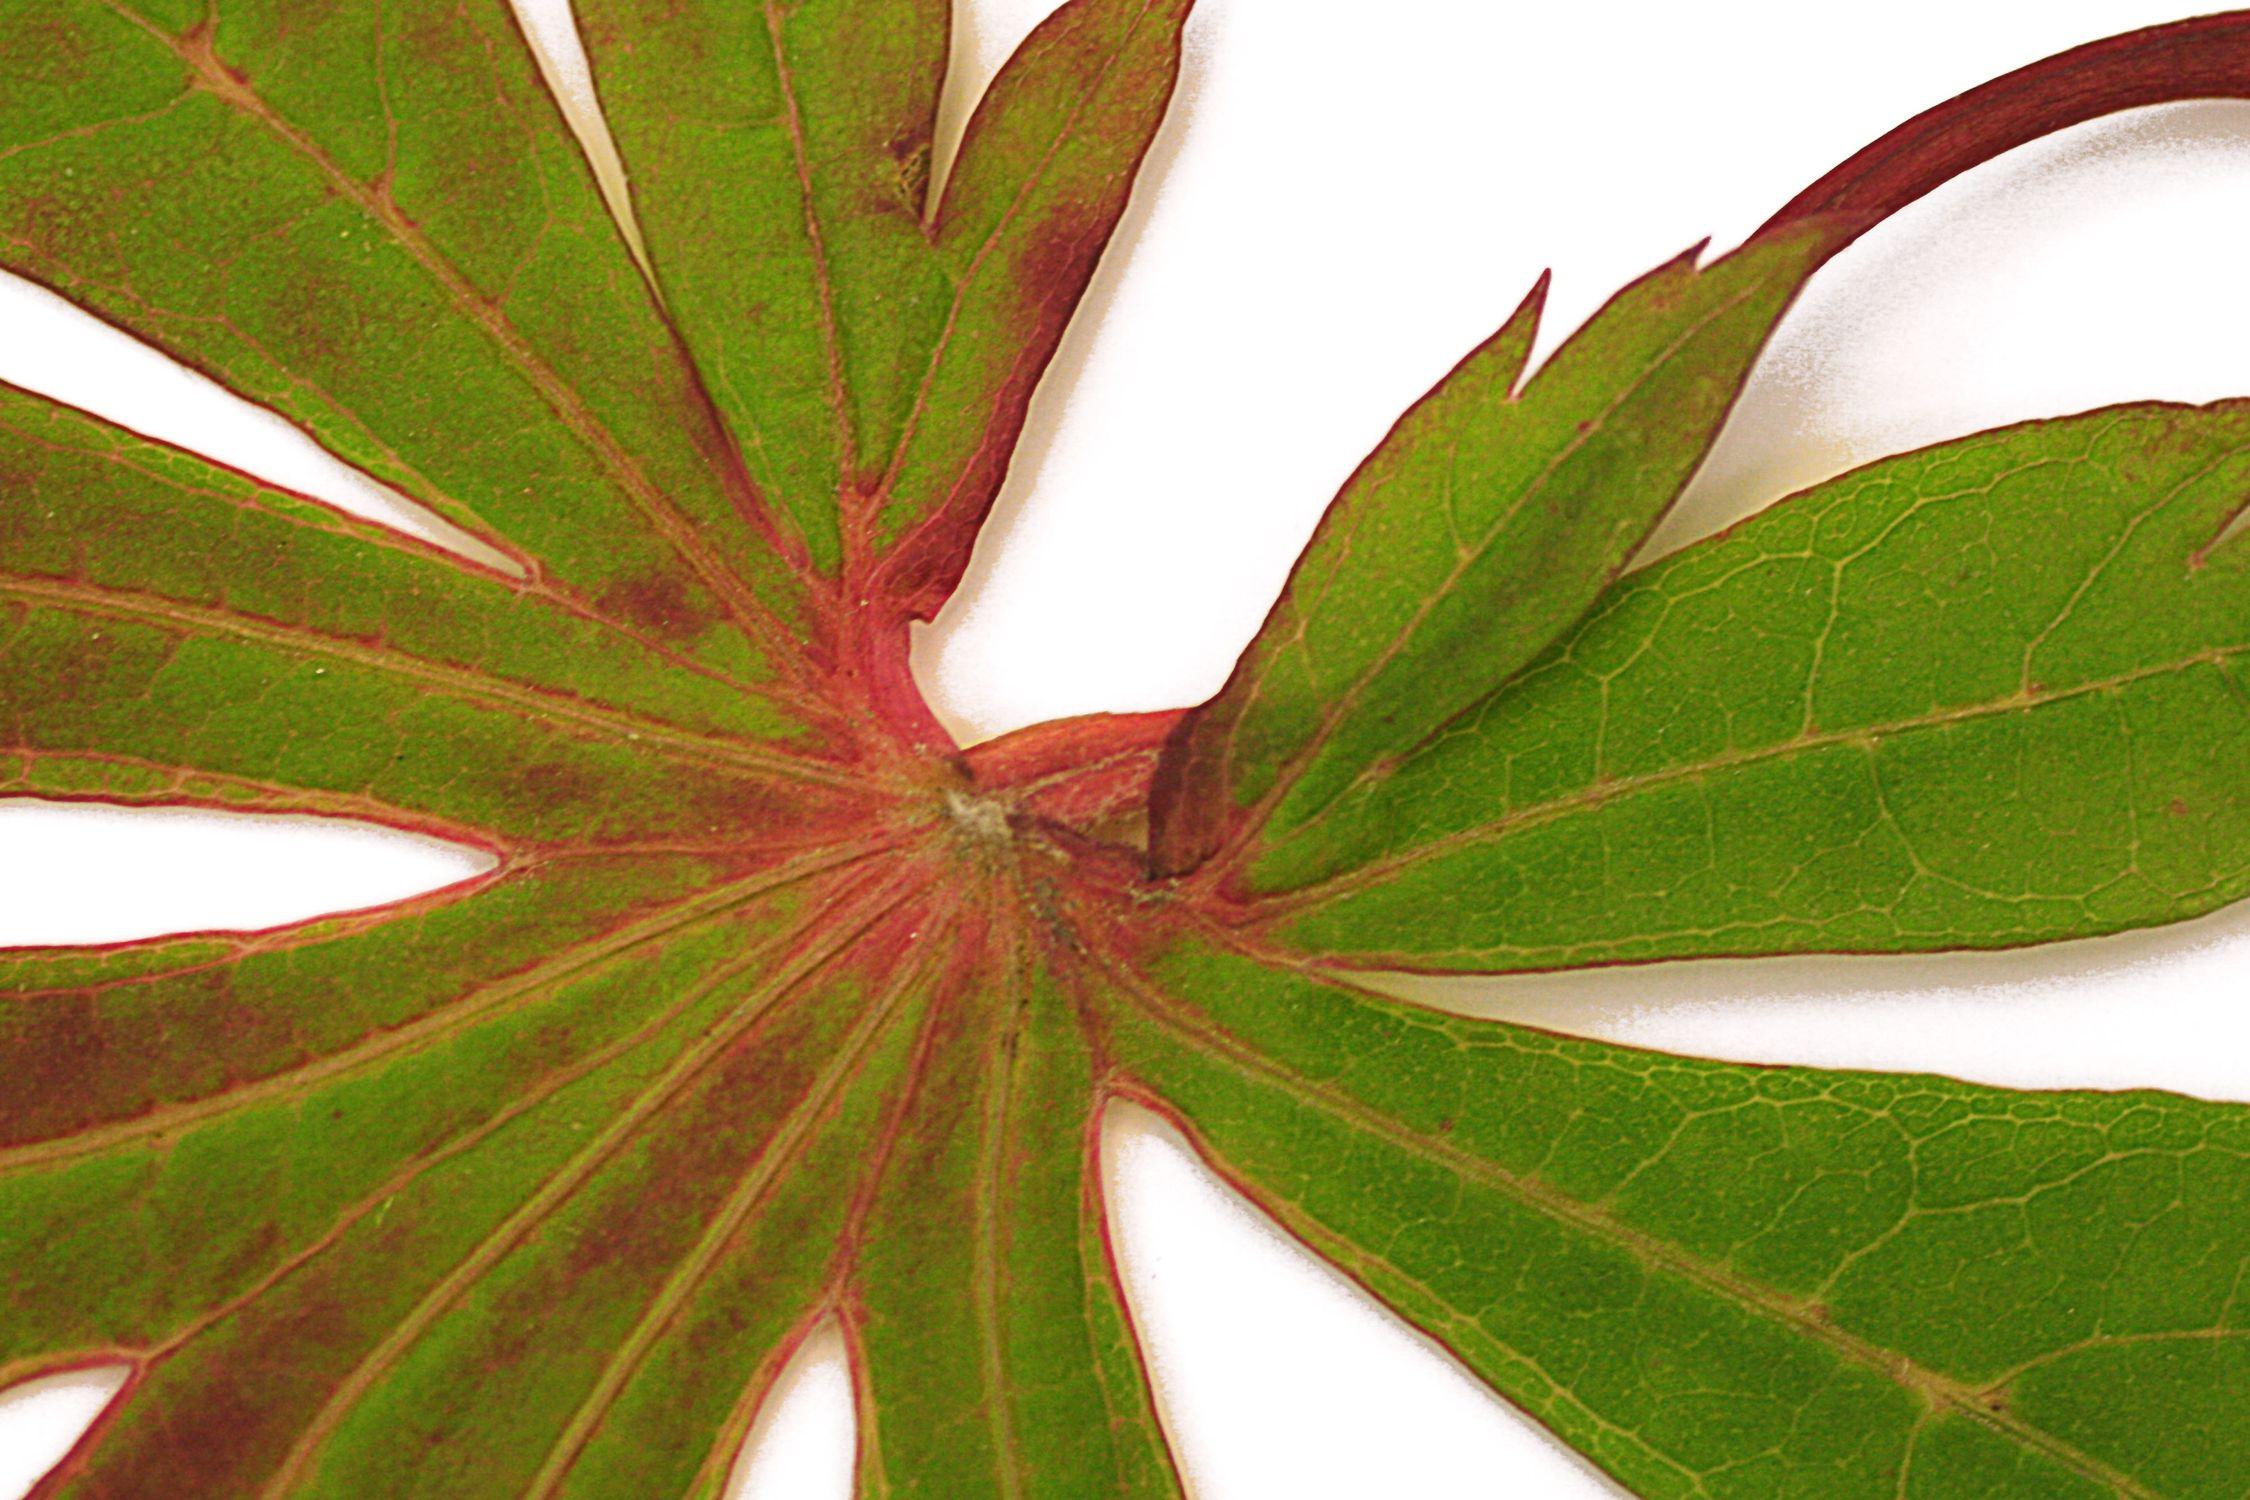 Bild mit Natur, Pflanzen, Blumen, Blätter, Blatt, Blattstruktur